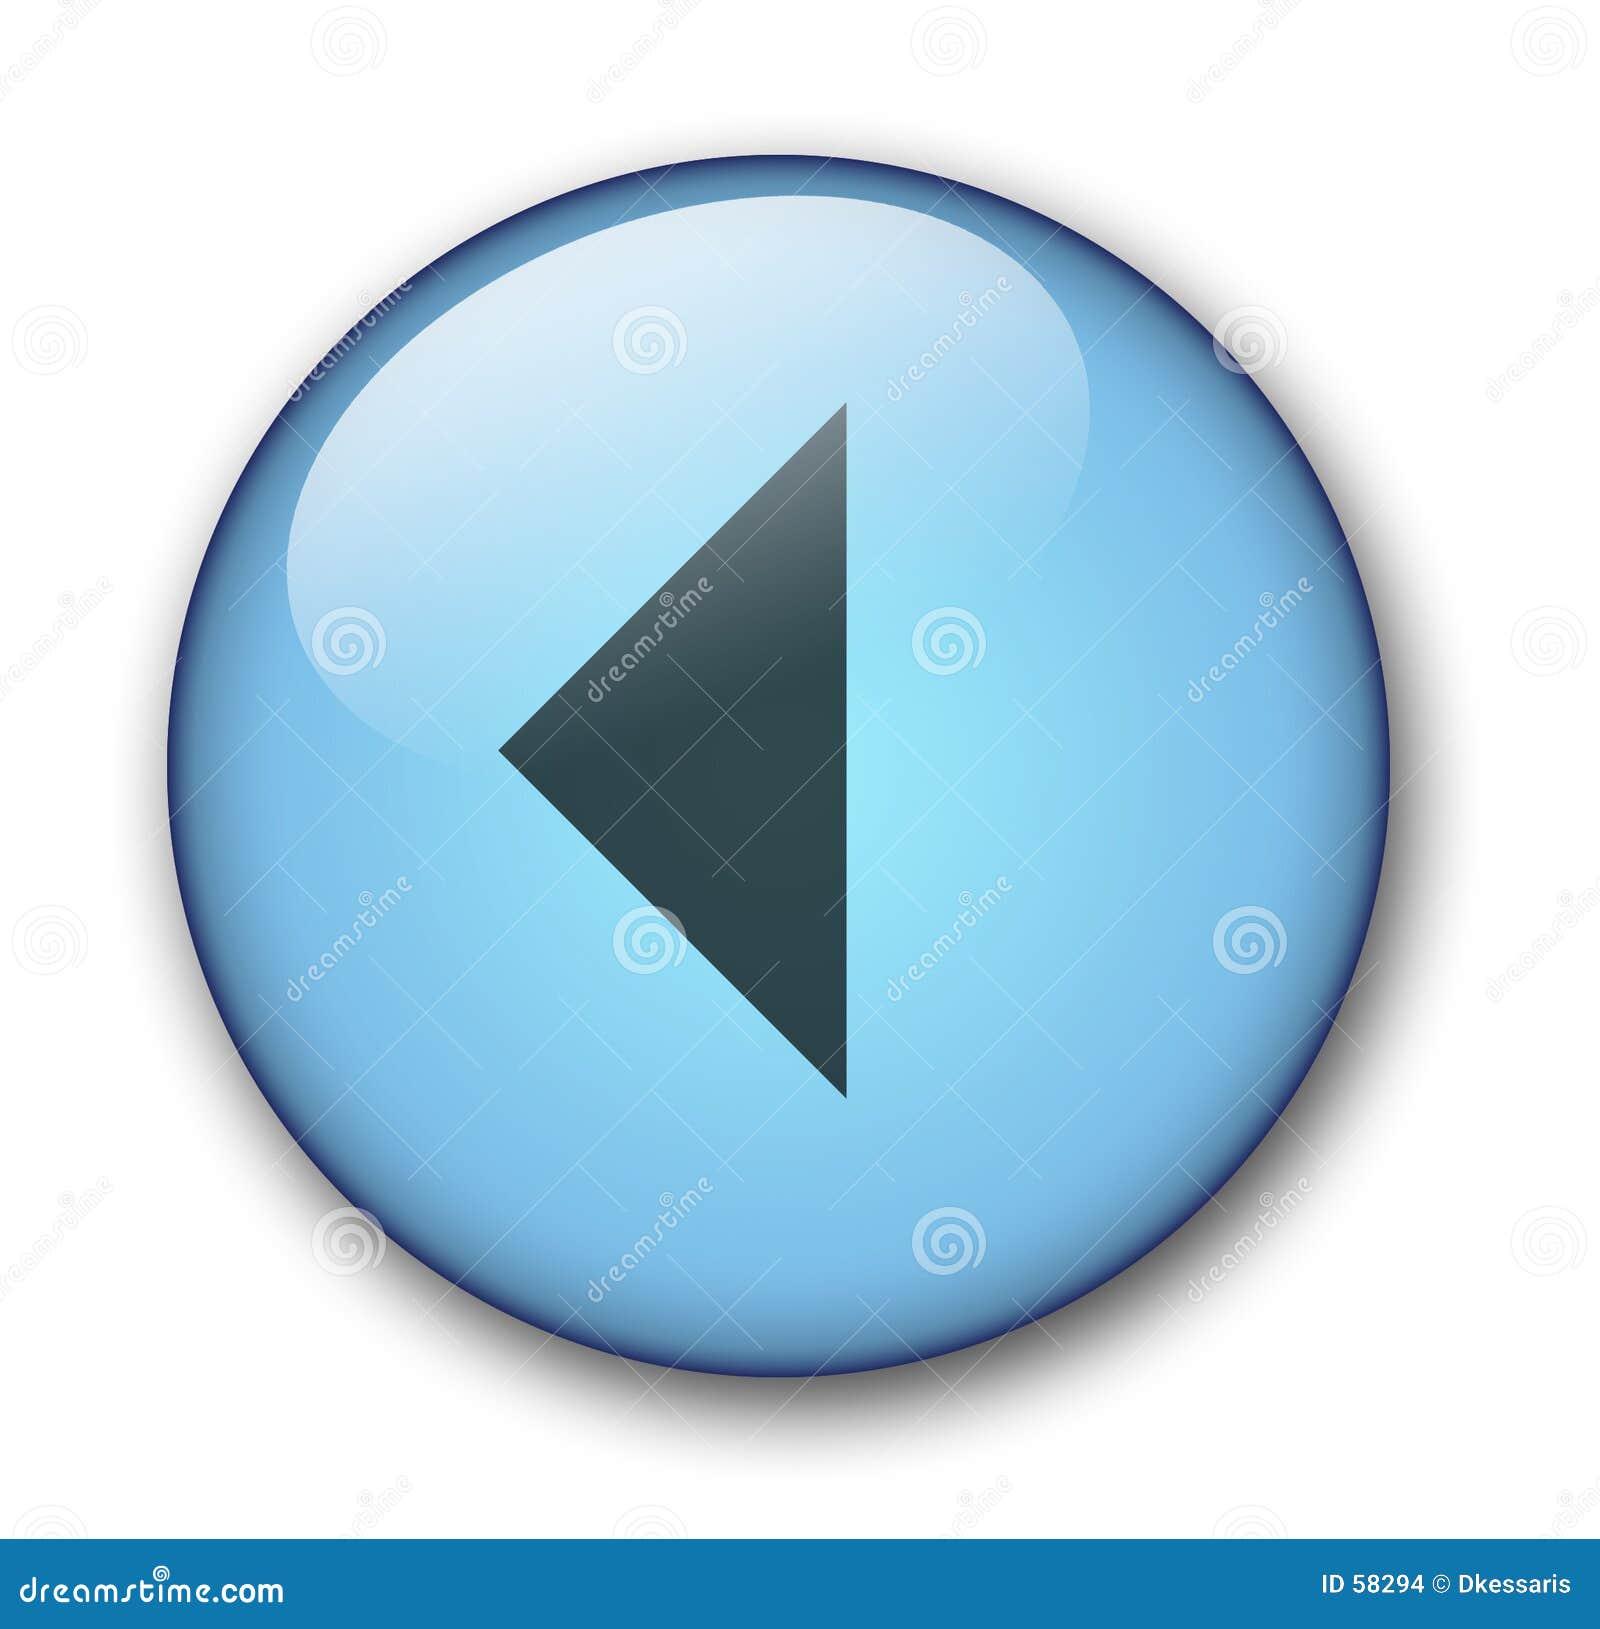 Download Ιστός κουμπιών aqua απεικόνιση αποθεμάτων. εικονογραφία από απεικόνιση - 58294